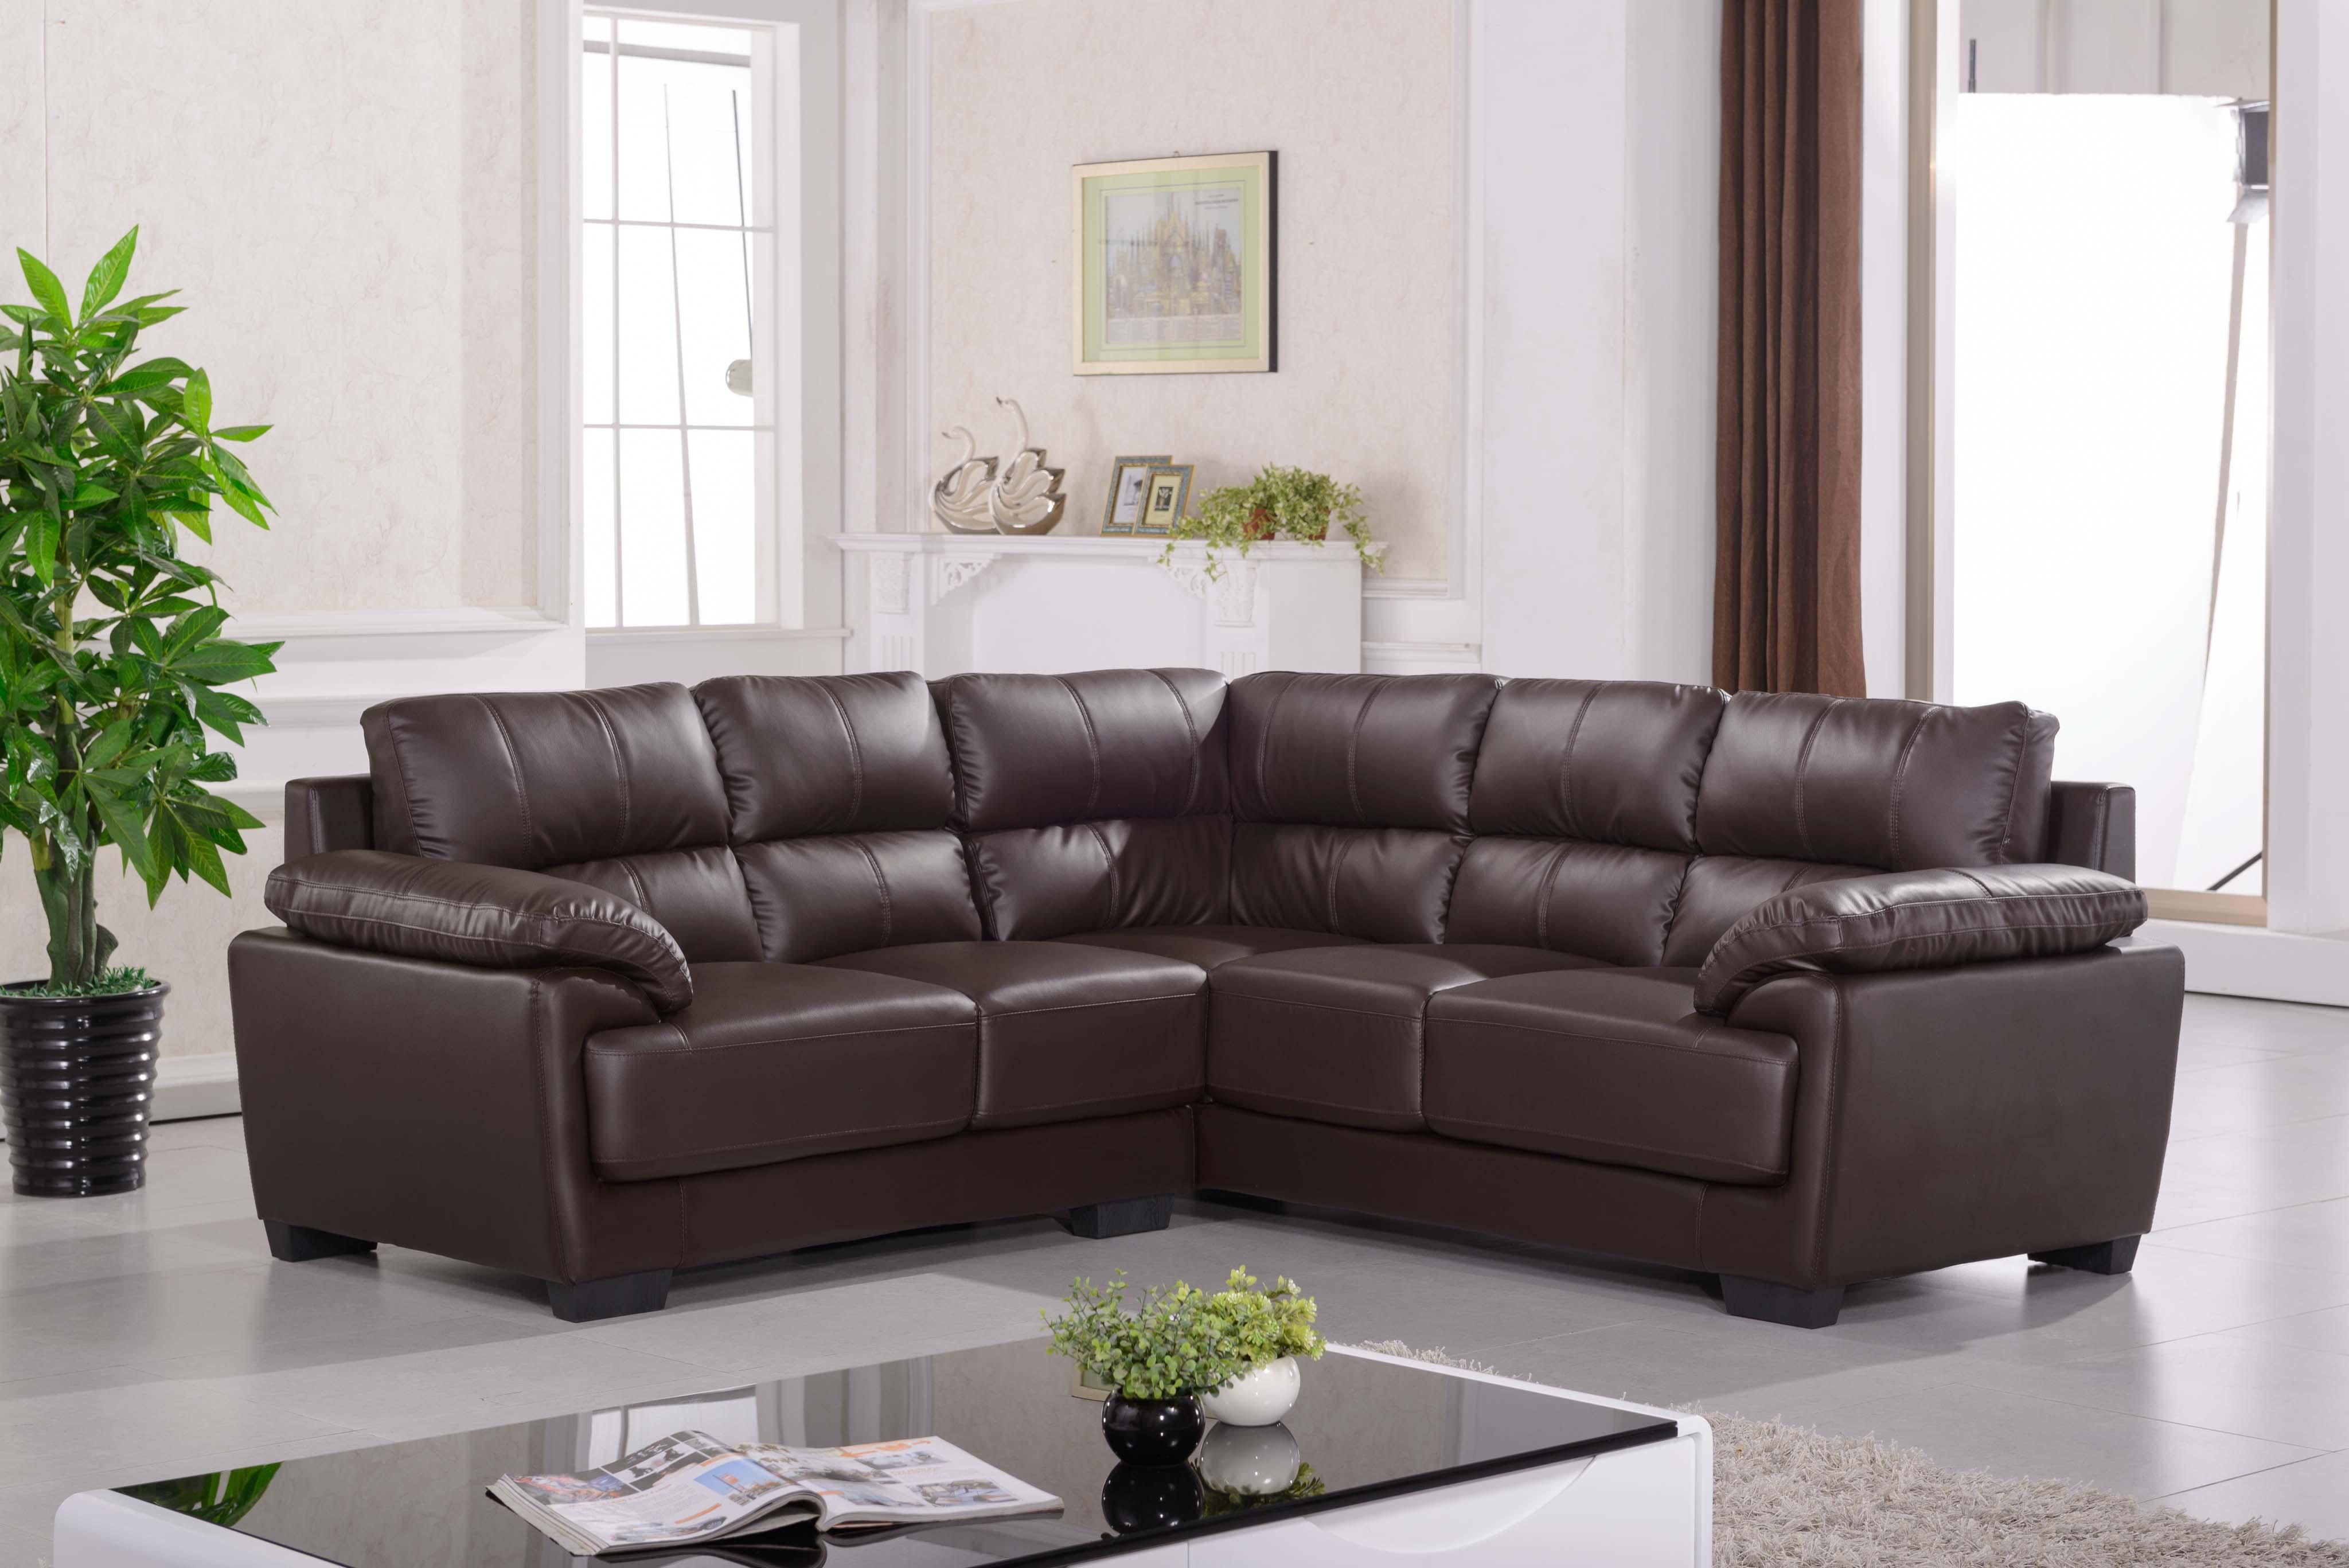 Corner Leather Sofa Corner Sofas L AL607 Leather Sofa